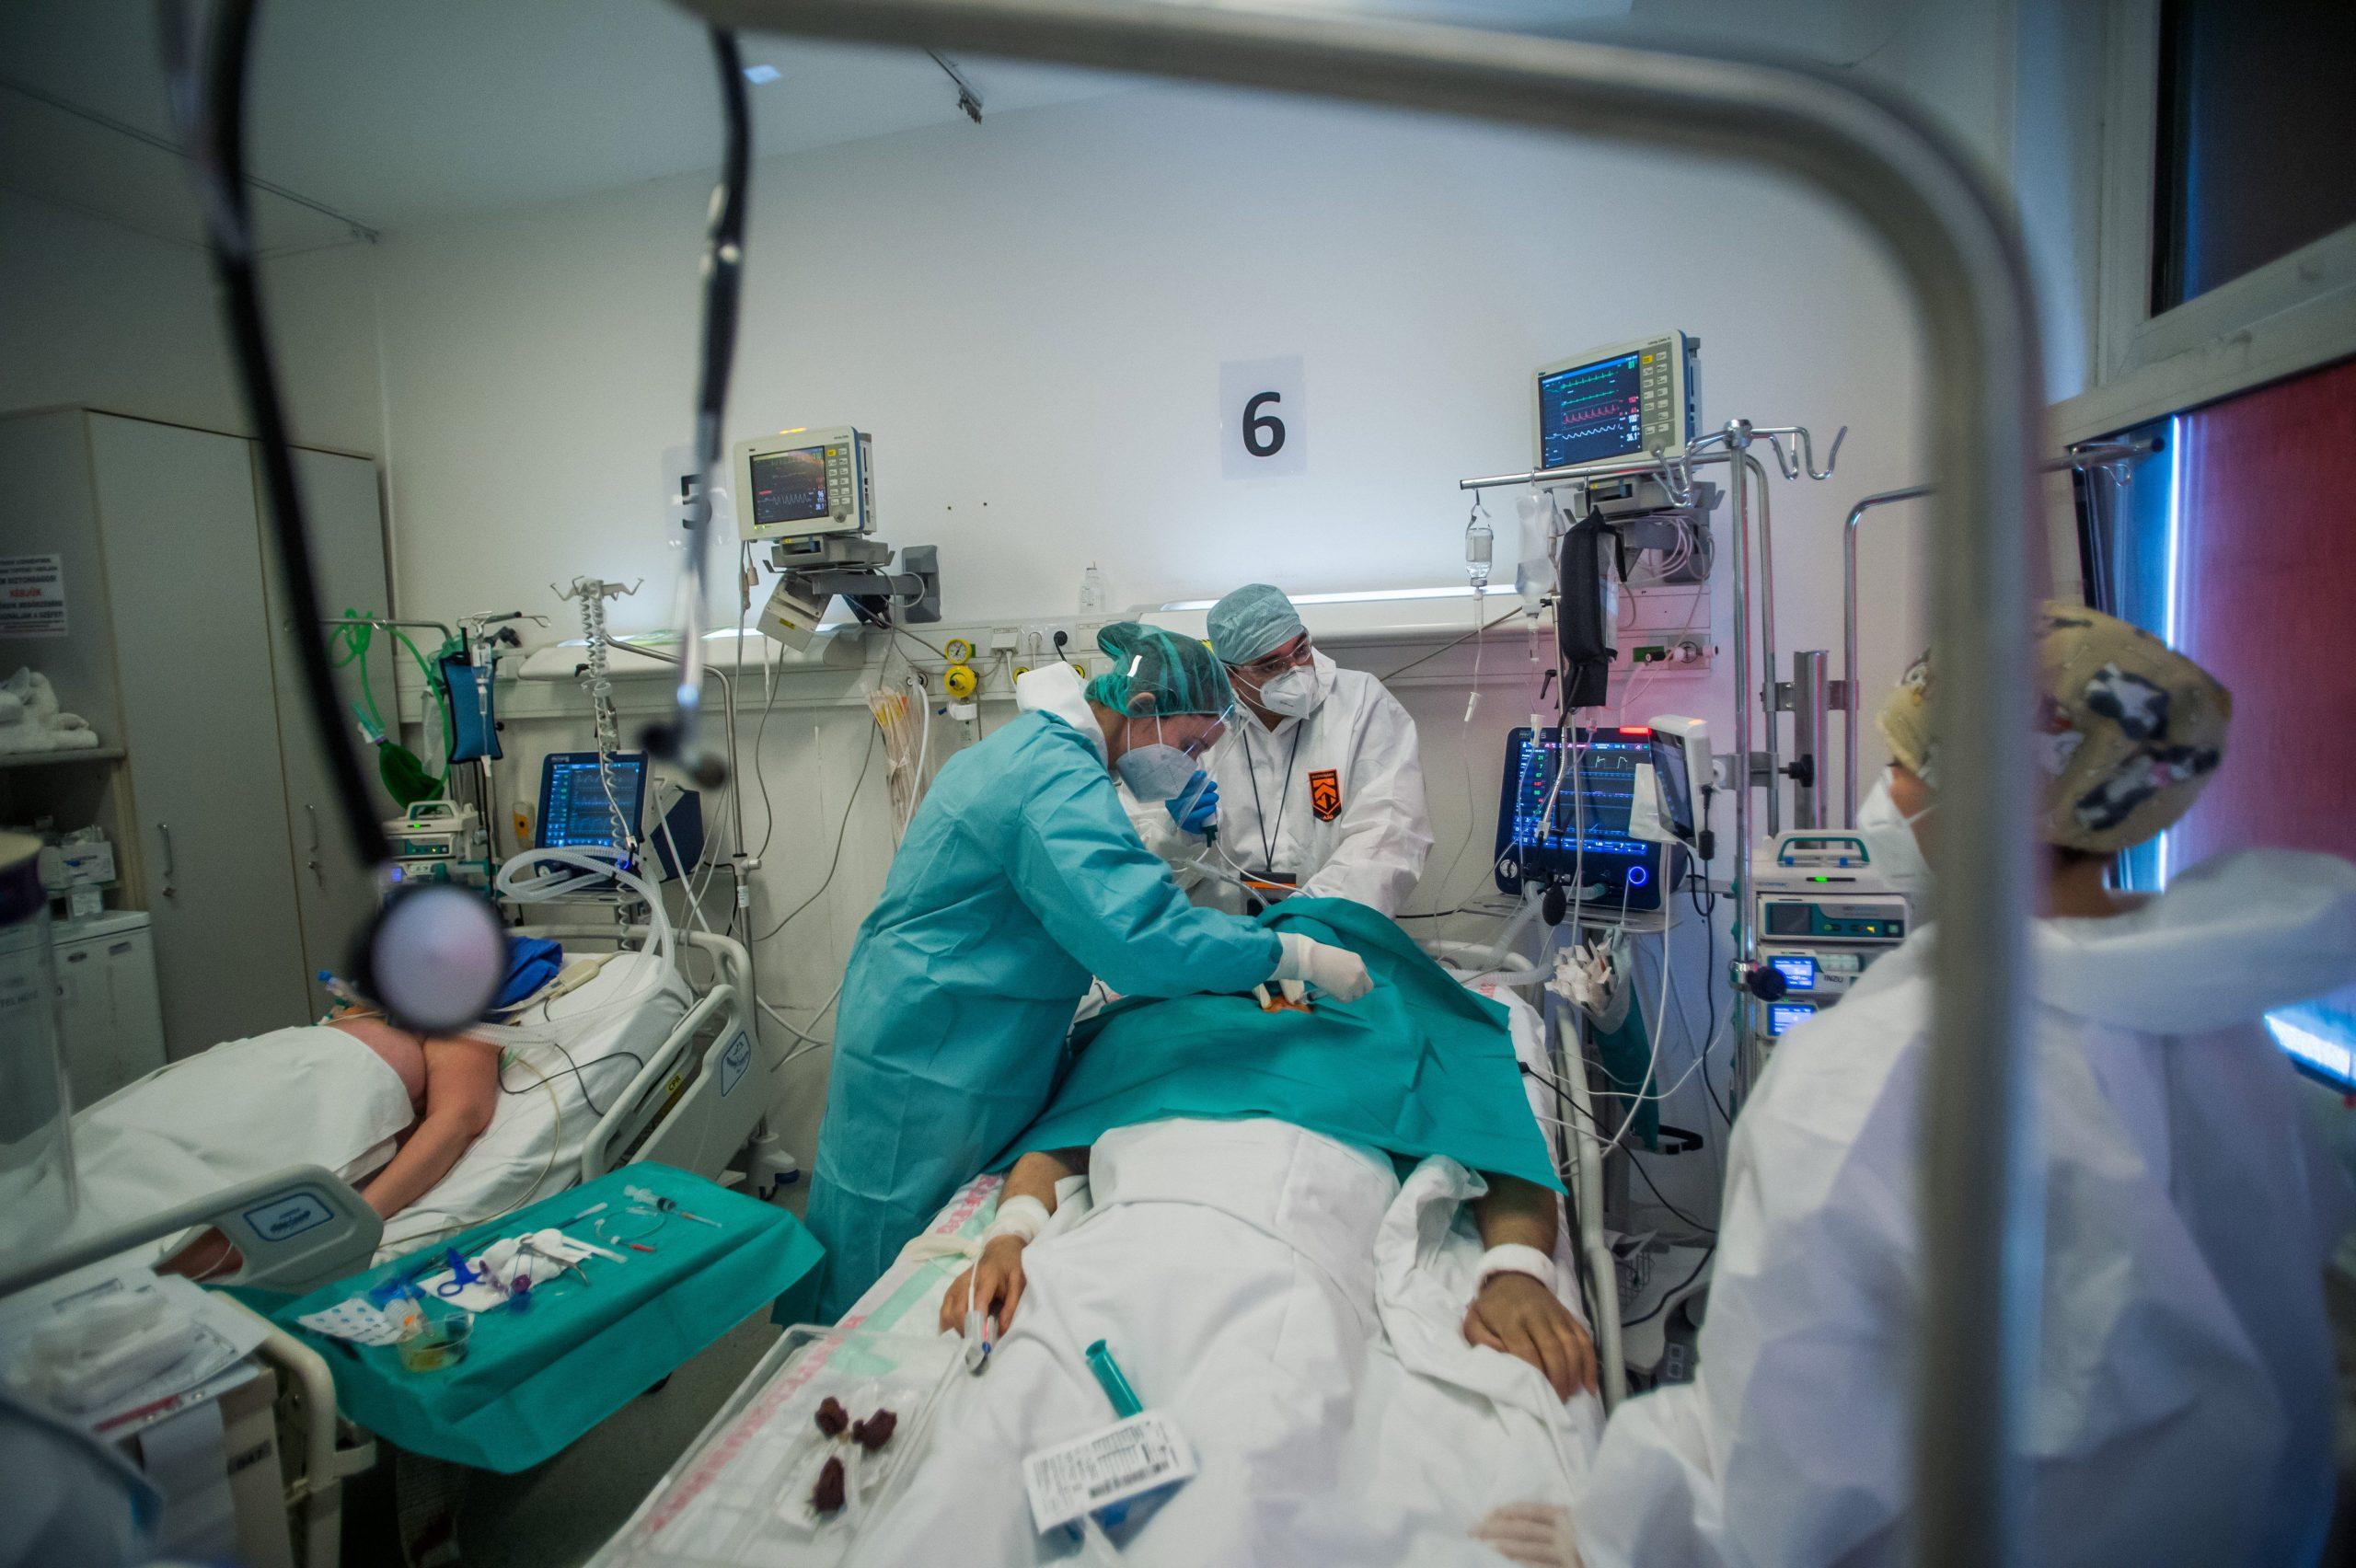 Coronavirus: 6 Fatalities, 531 New Infections Reported in Hungary